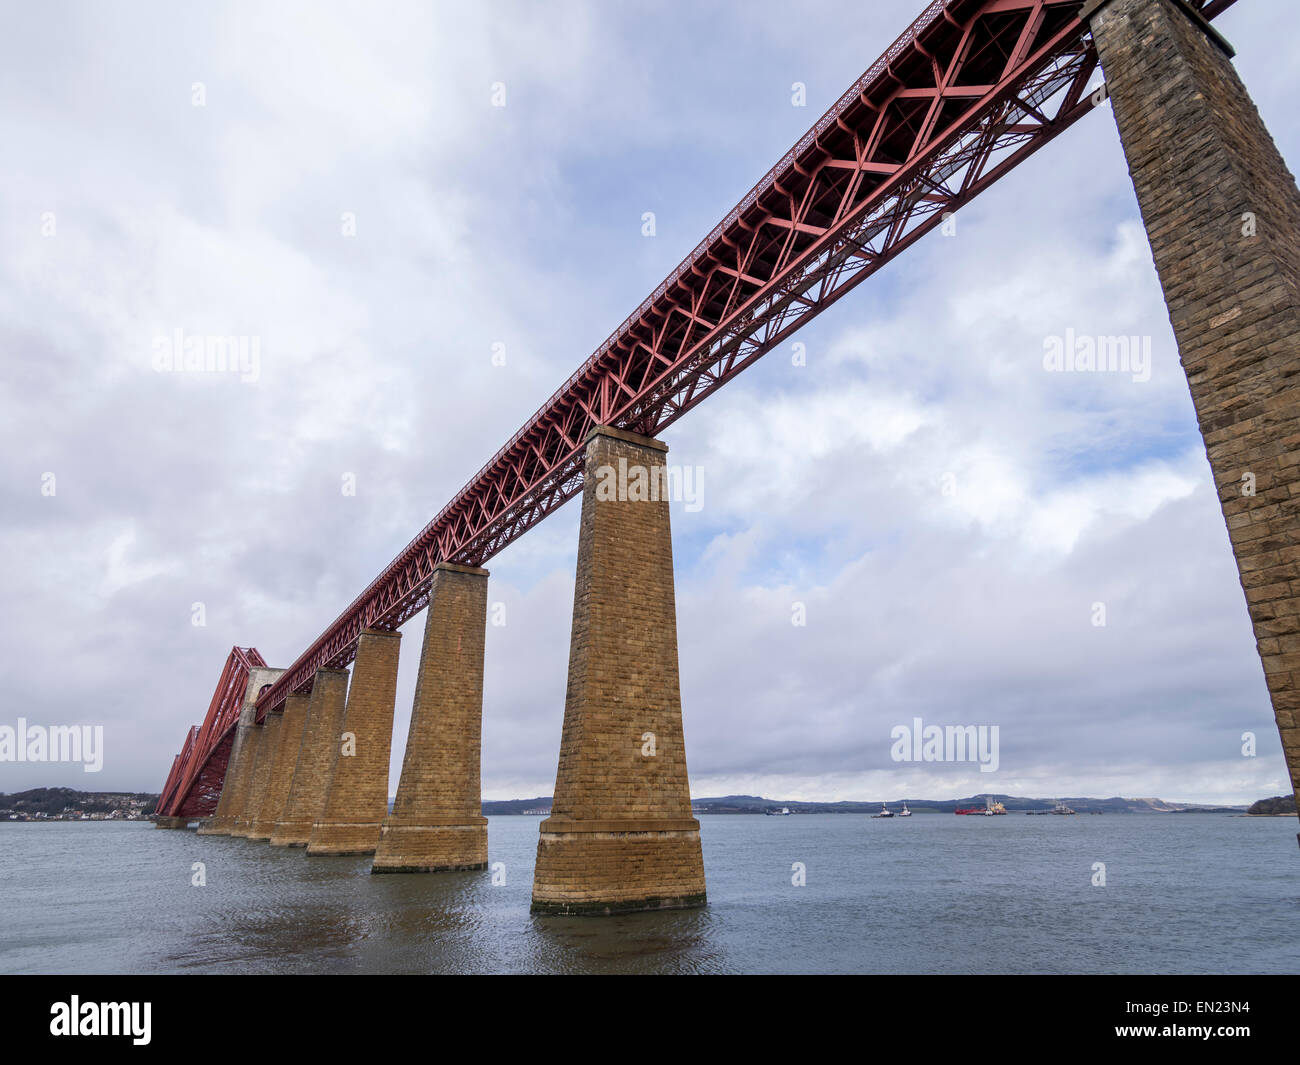 Forth Bridge, cantilever railway bridge over the Firth of Forth, Edinburgh, Scotland, UK - Stock Image